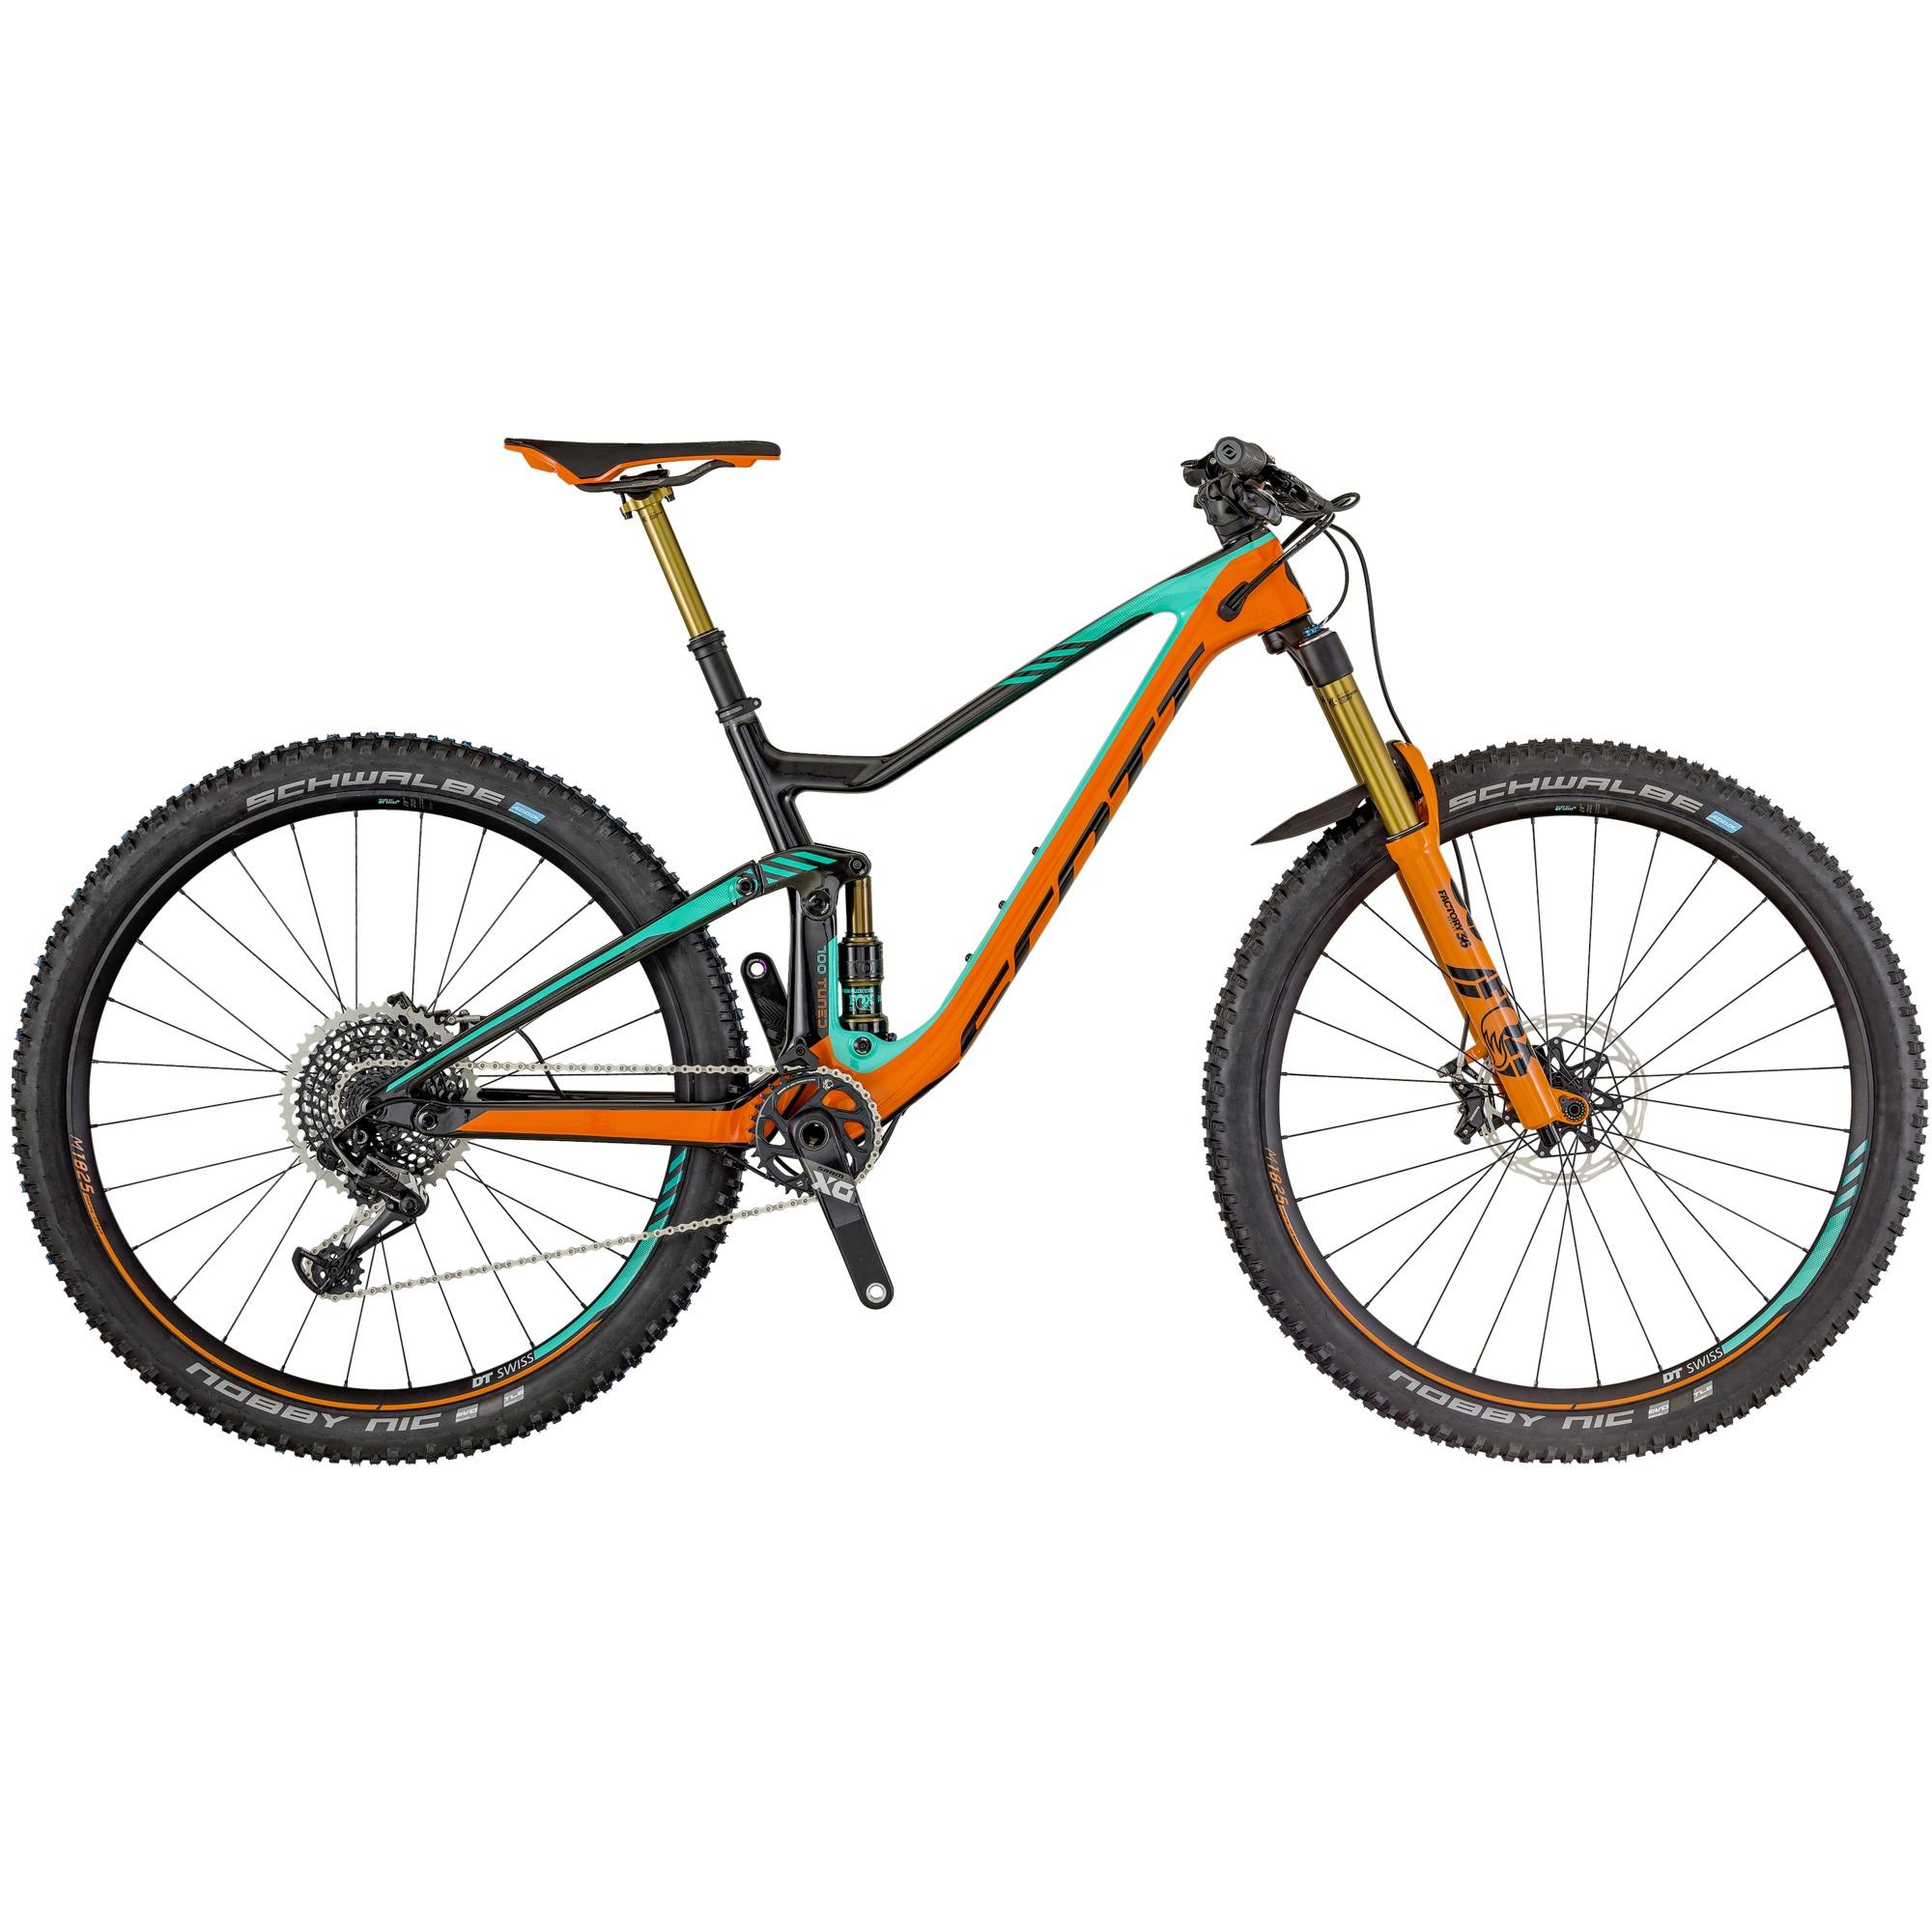 SCOTT Genius 900 Tuned Bike M - Rad & Dämpferklinik GmbH